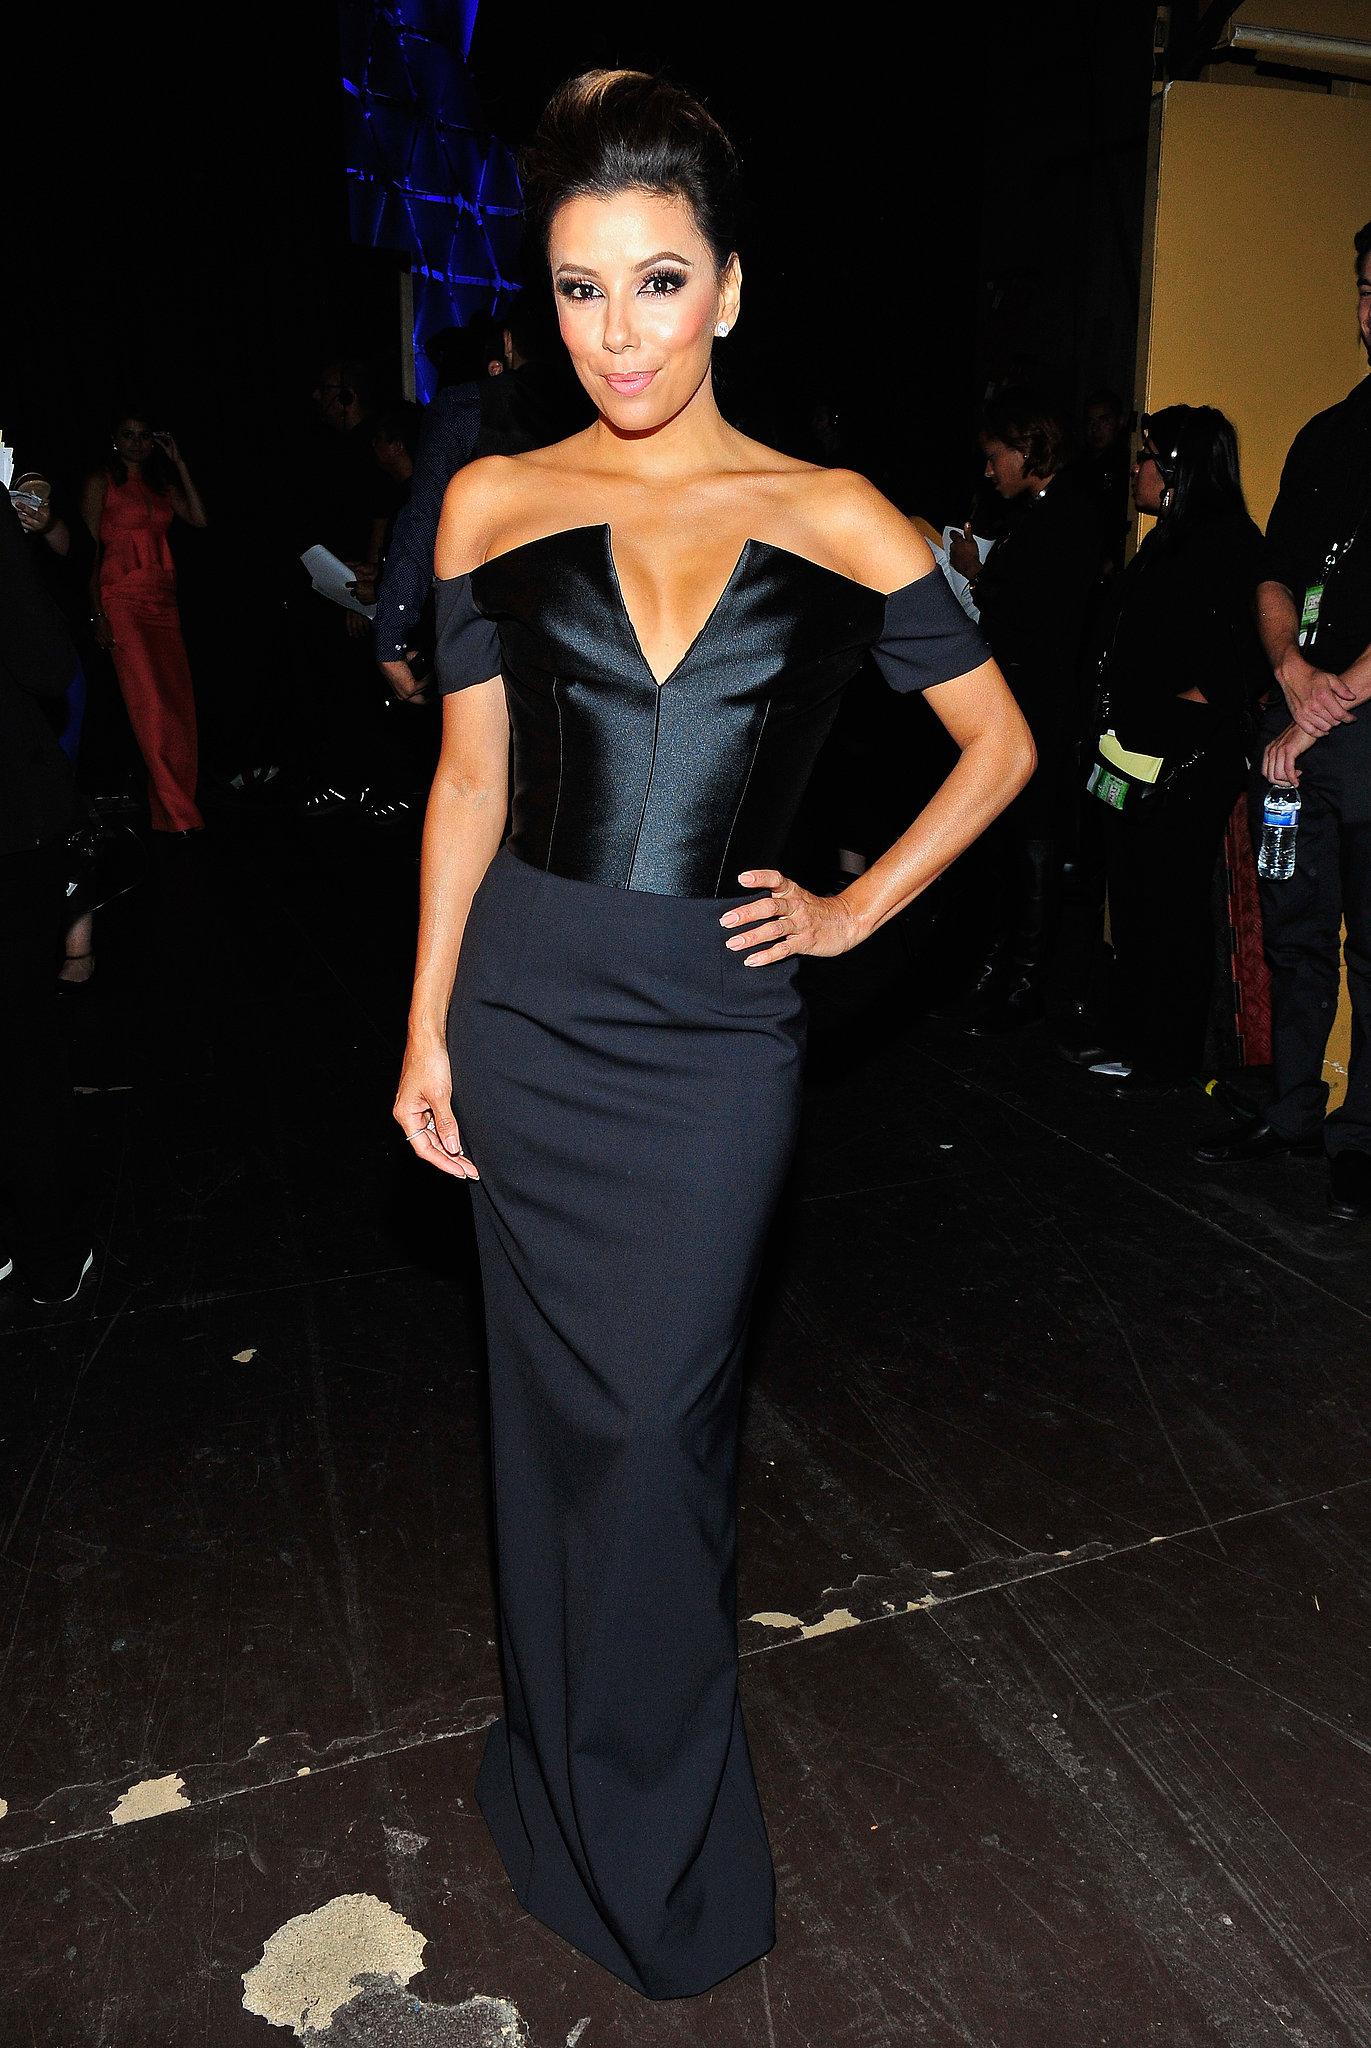 Eva Longoria hosted the ALMA Awards in LA.